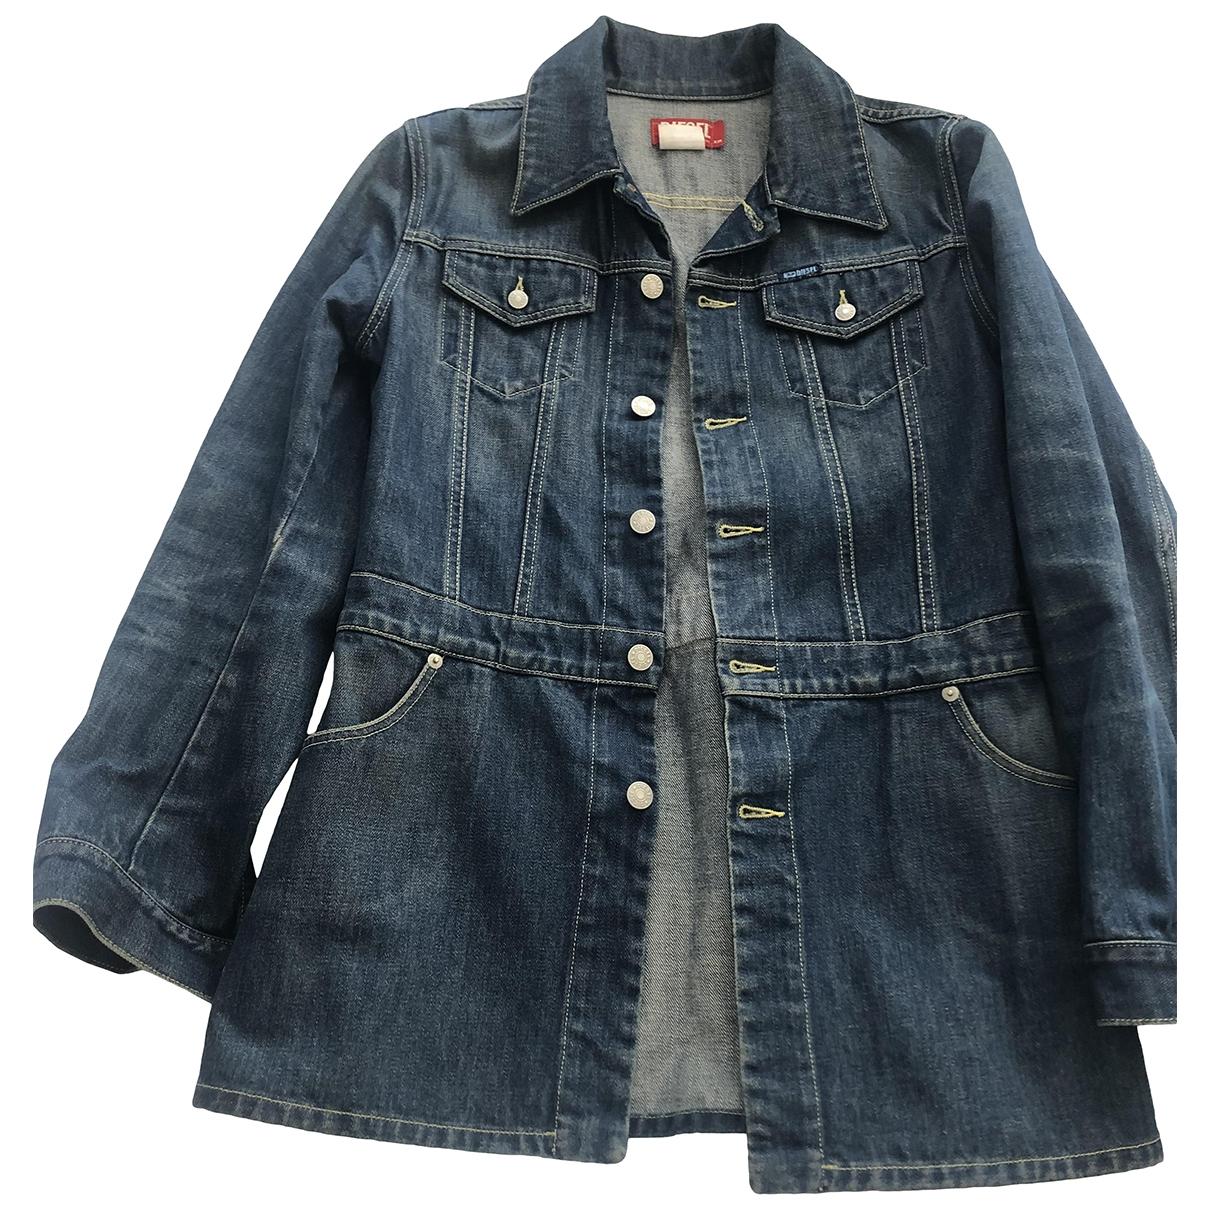 Diesel \N Blue Denim - Jeans jacket for Women 38 FR